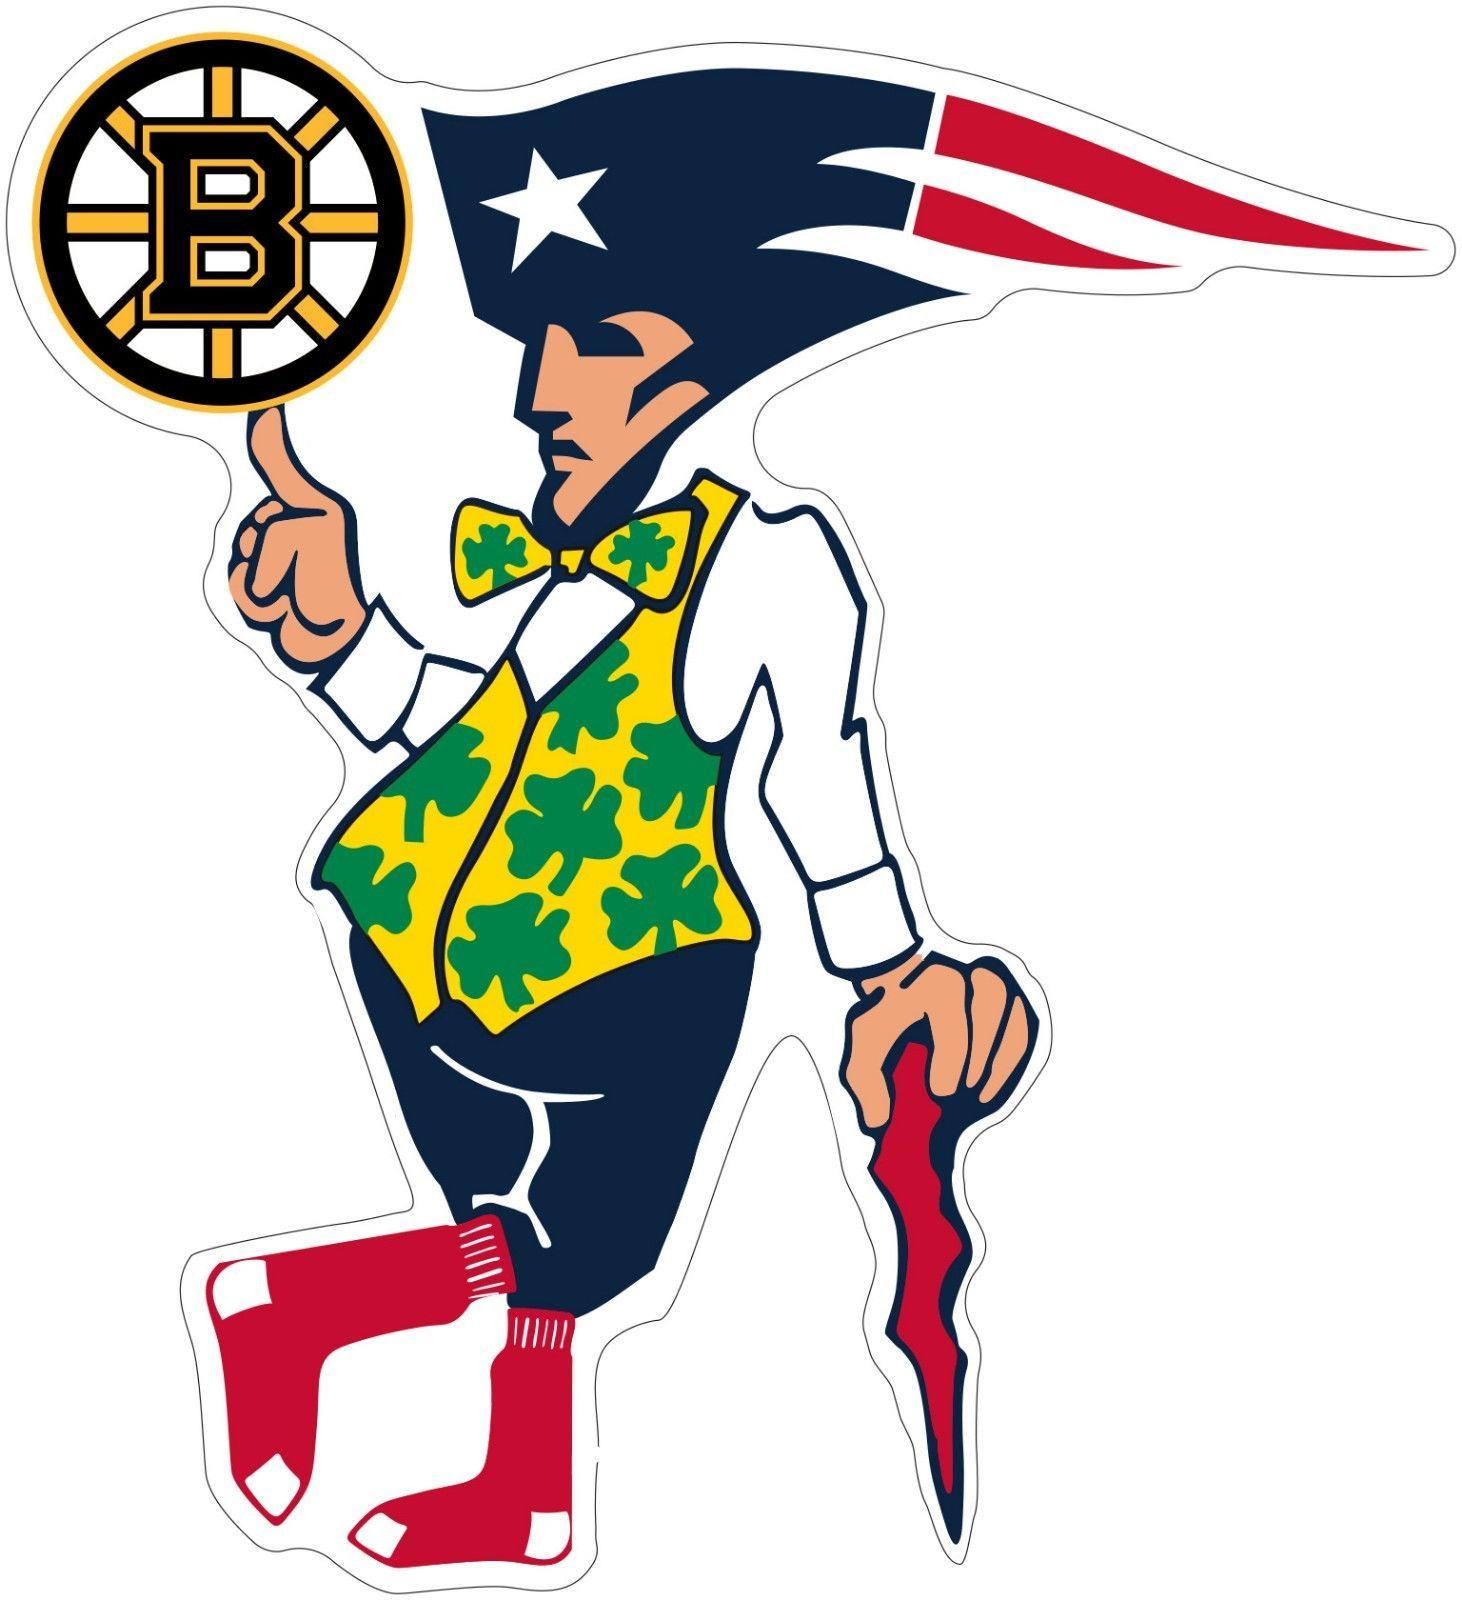 Boston Guy Sports Teams Logo Mash Up Vinyl Decal Sticker Celtics Red Sox Bruins Https Uxshops Com Buy Boston Gu Sports Team Logos Boston Sports Sports Decals [ 1600 x 1462 Pixel ]